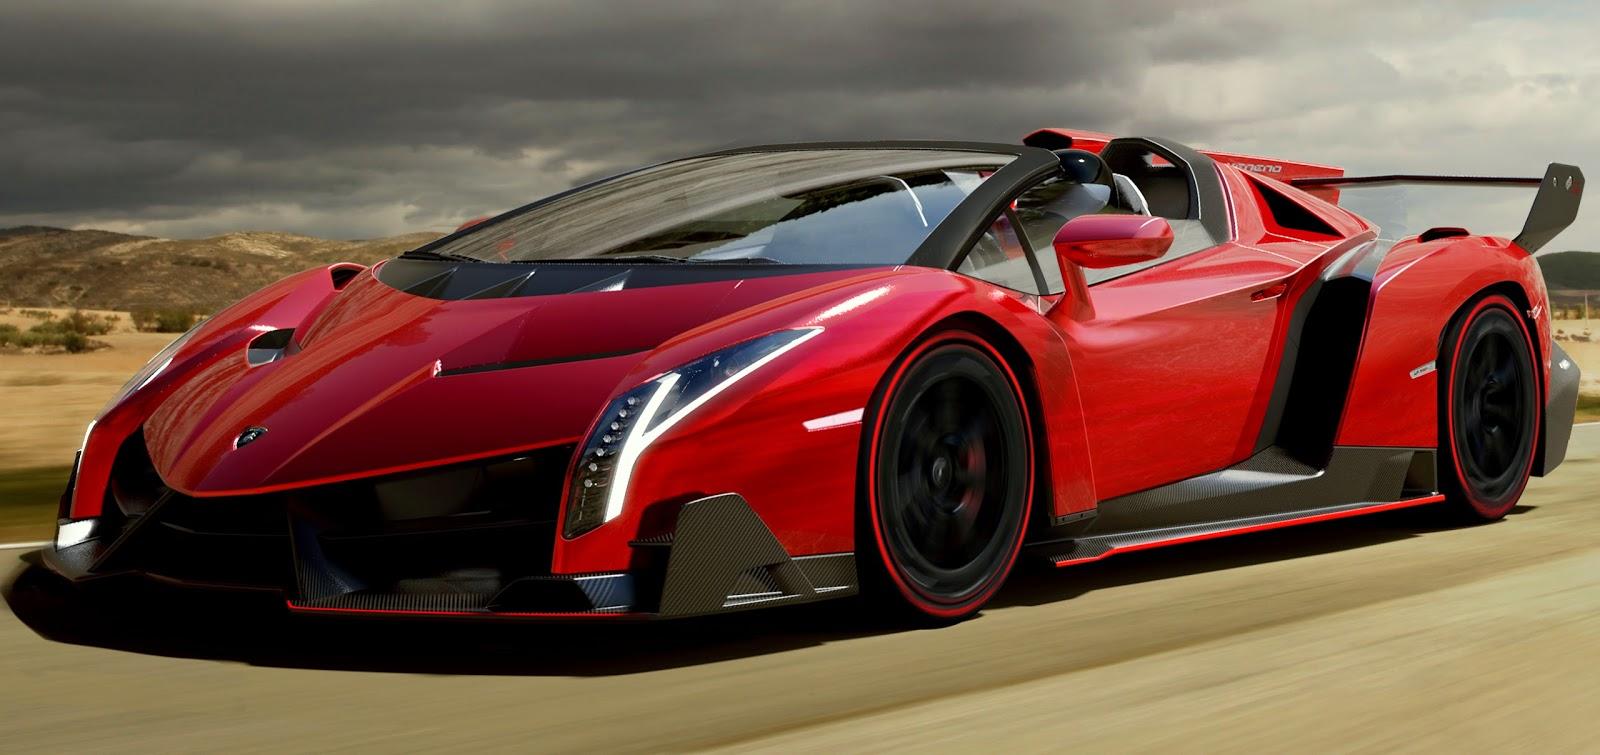 uautoknownet Lamborghini unleashes the Veneno Roadster